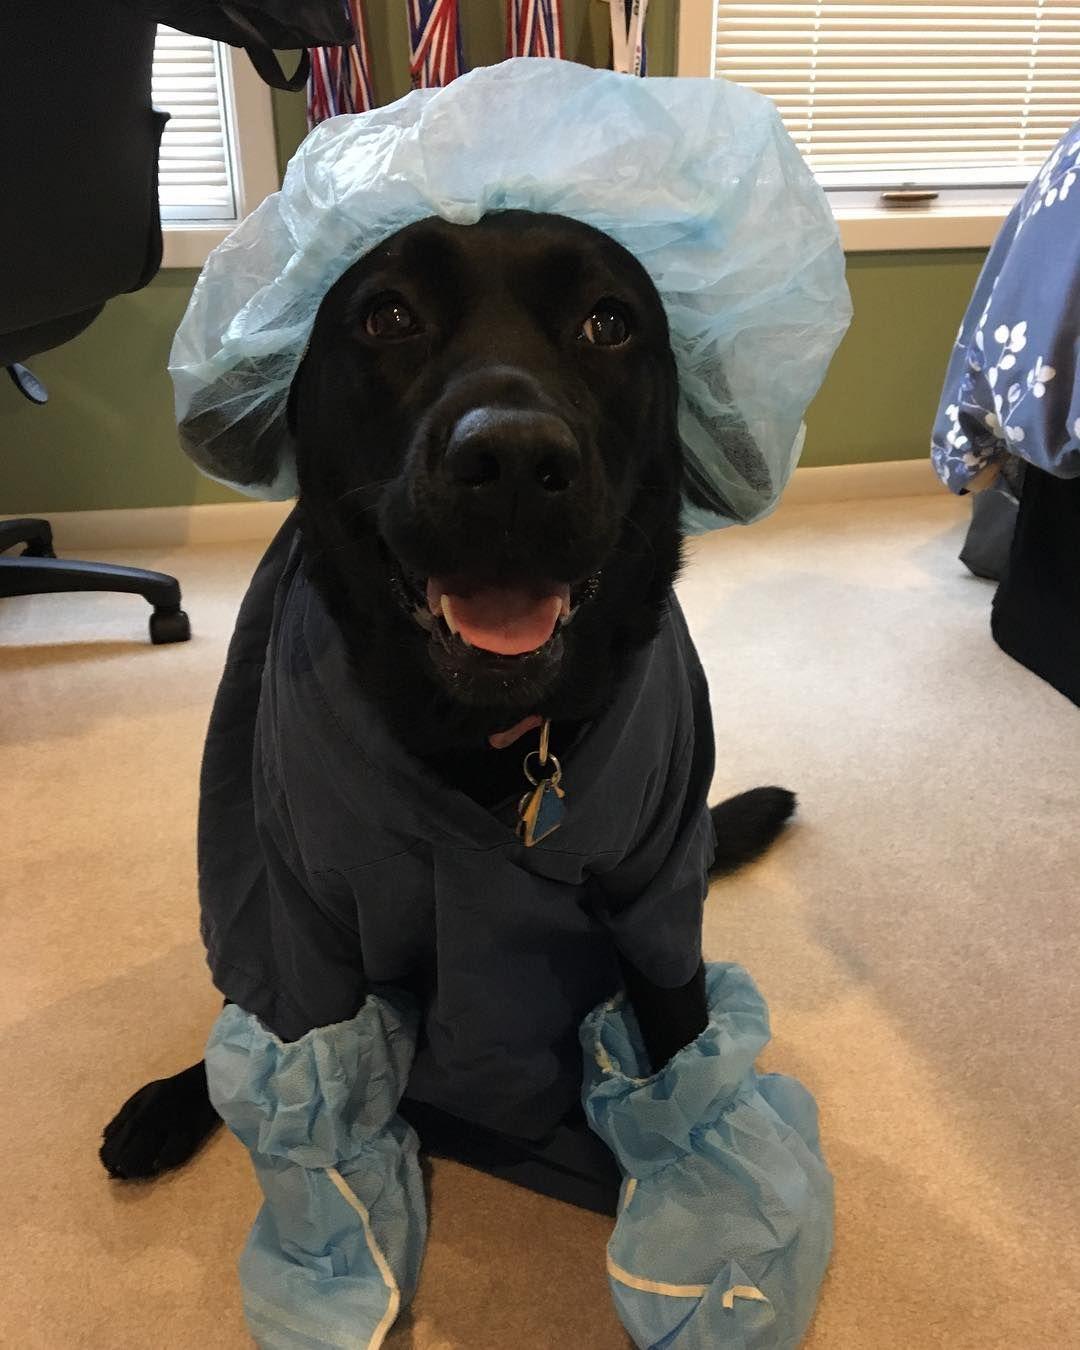 Animal Jobs Near Me 2020 Dog doctor, Animals, Dog lovers